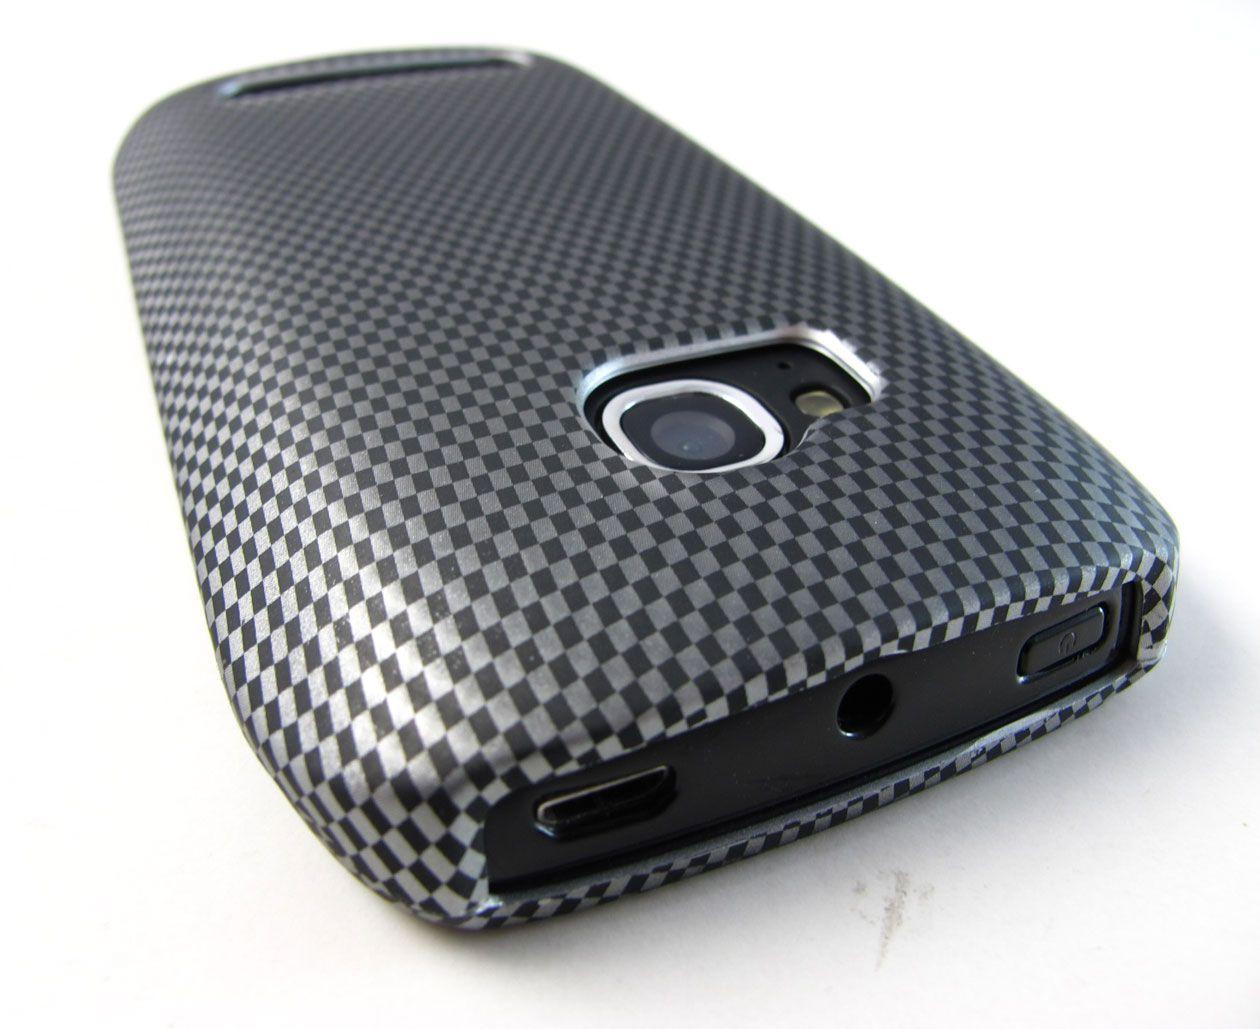 FIBER DESIGN HARD CASE COVER NOKIA LUMIA 710 TMOBILE PHONE ACCESSORY